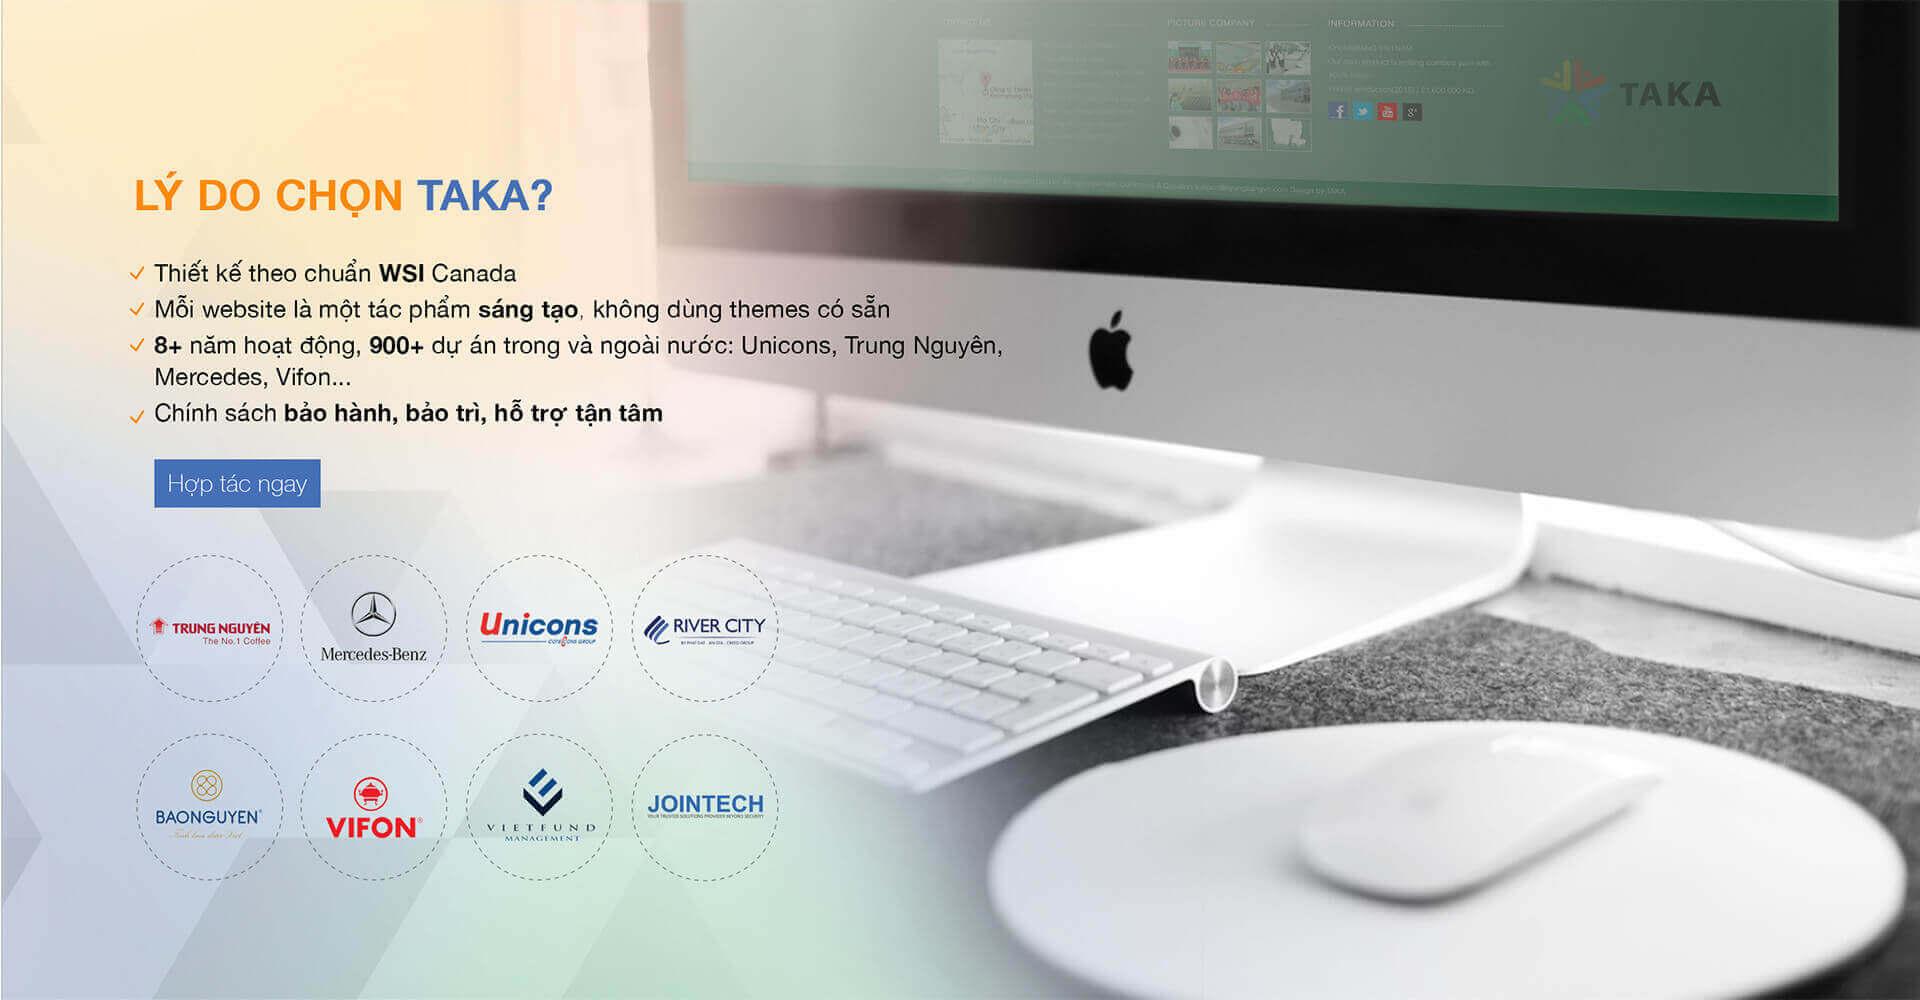 lý do nên chọn taka